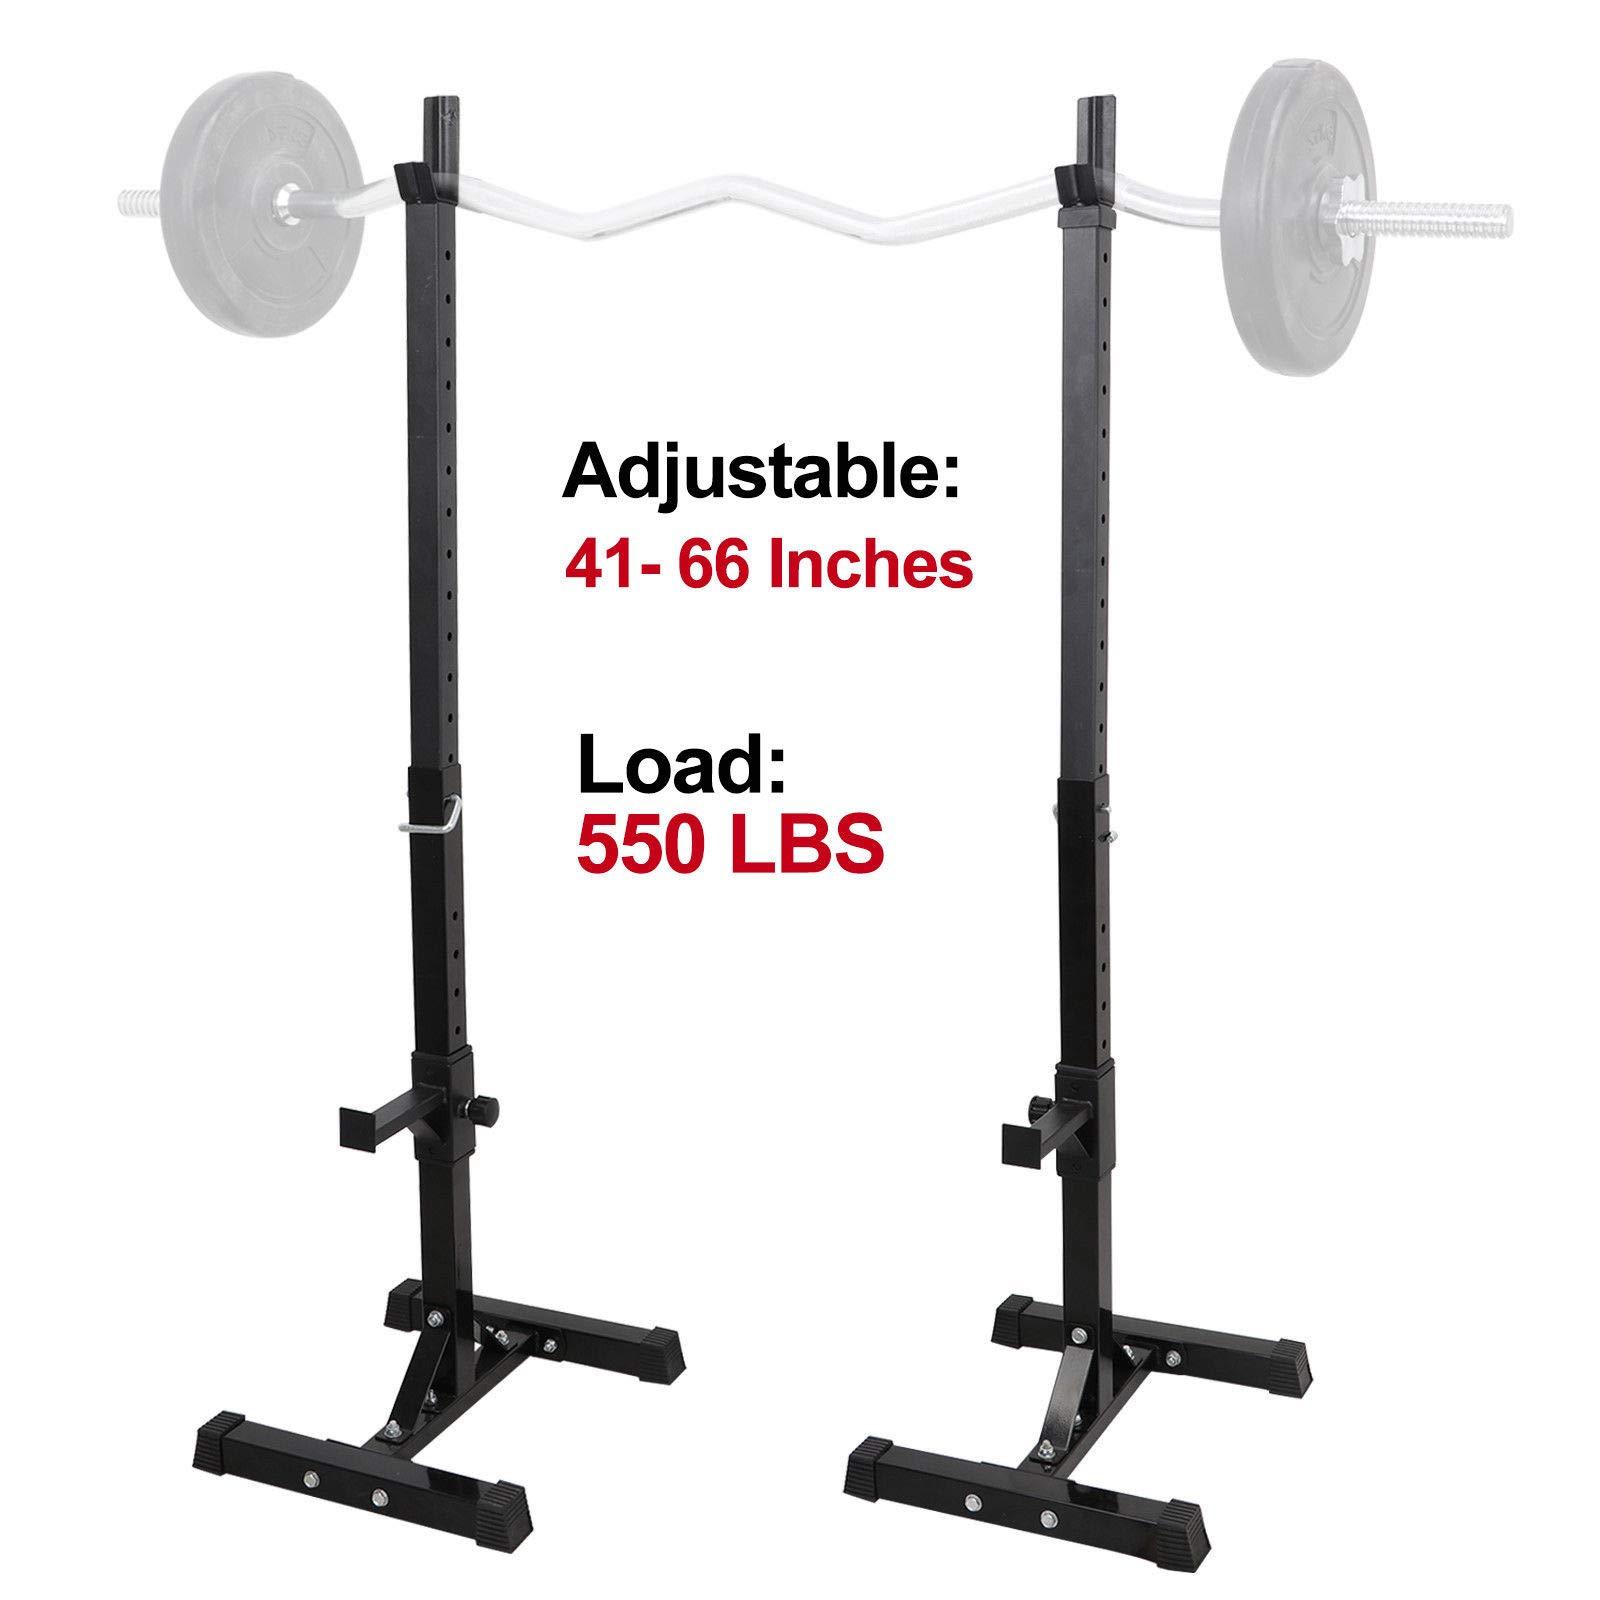 Mandycng Sturdy Free-Weight Barbell Holder Rest Rack Adjustable Rack Standard Steel Squat Stands Barbell Free Press Bench Set of 2pcs